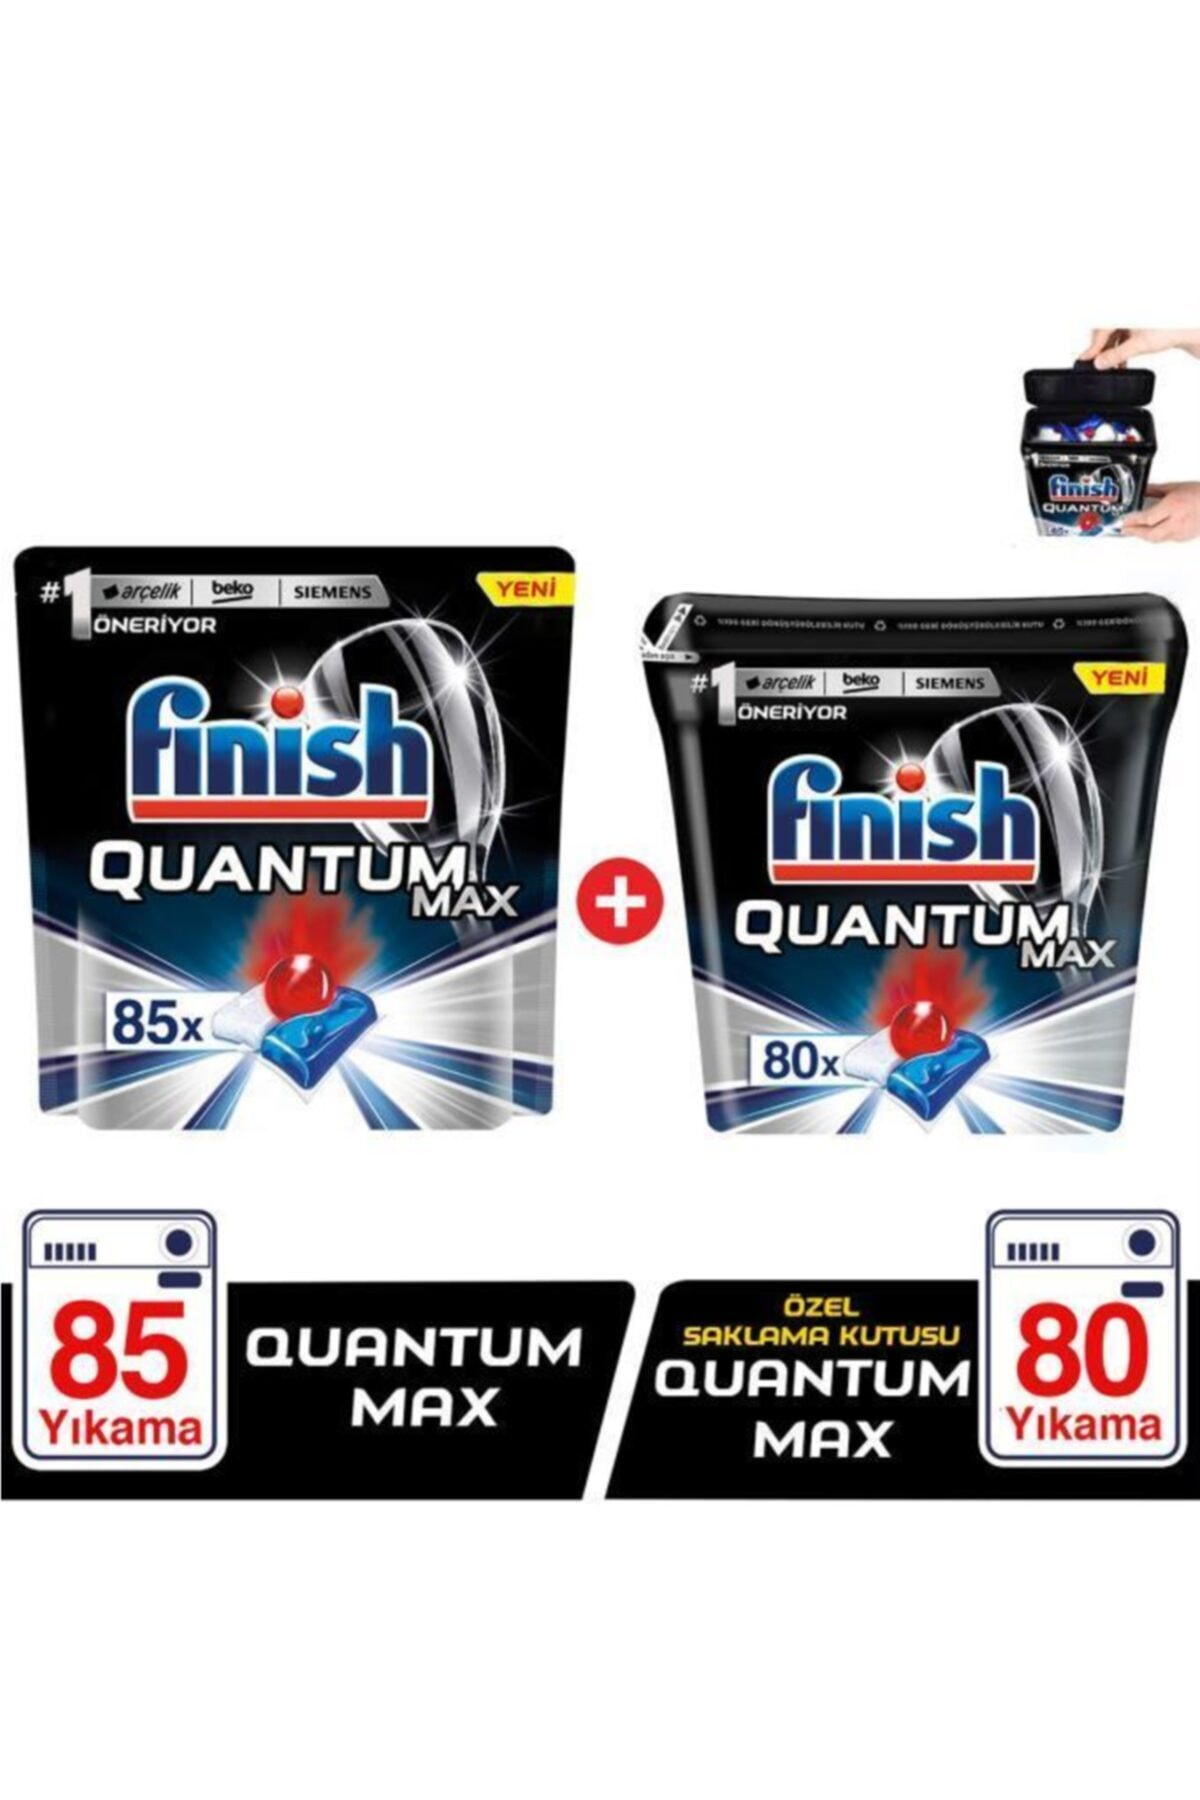 Finish Quantum Max 85 Kapsül+özel Saklama Kutusunda Quantum Max 80 Kapsül Bulaşık Makinesi Deterjanı 1